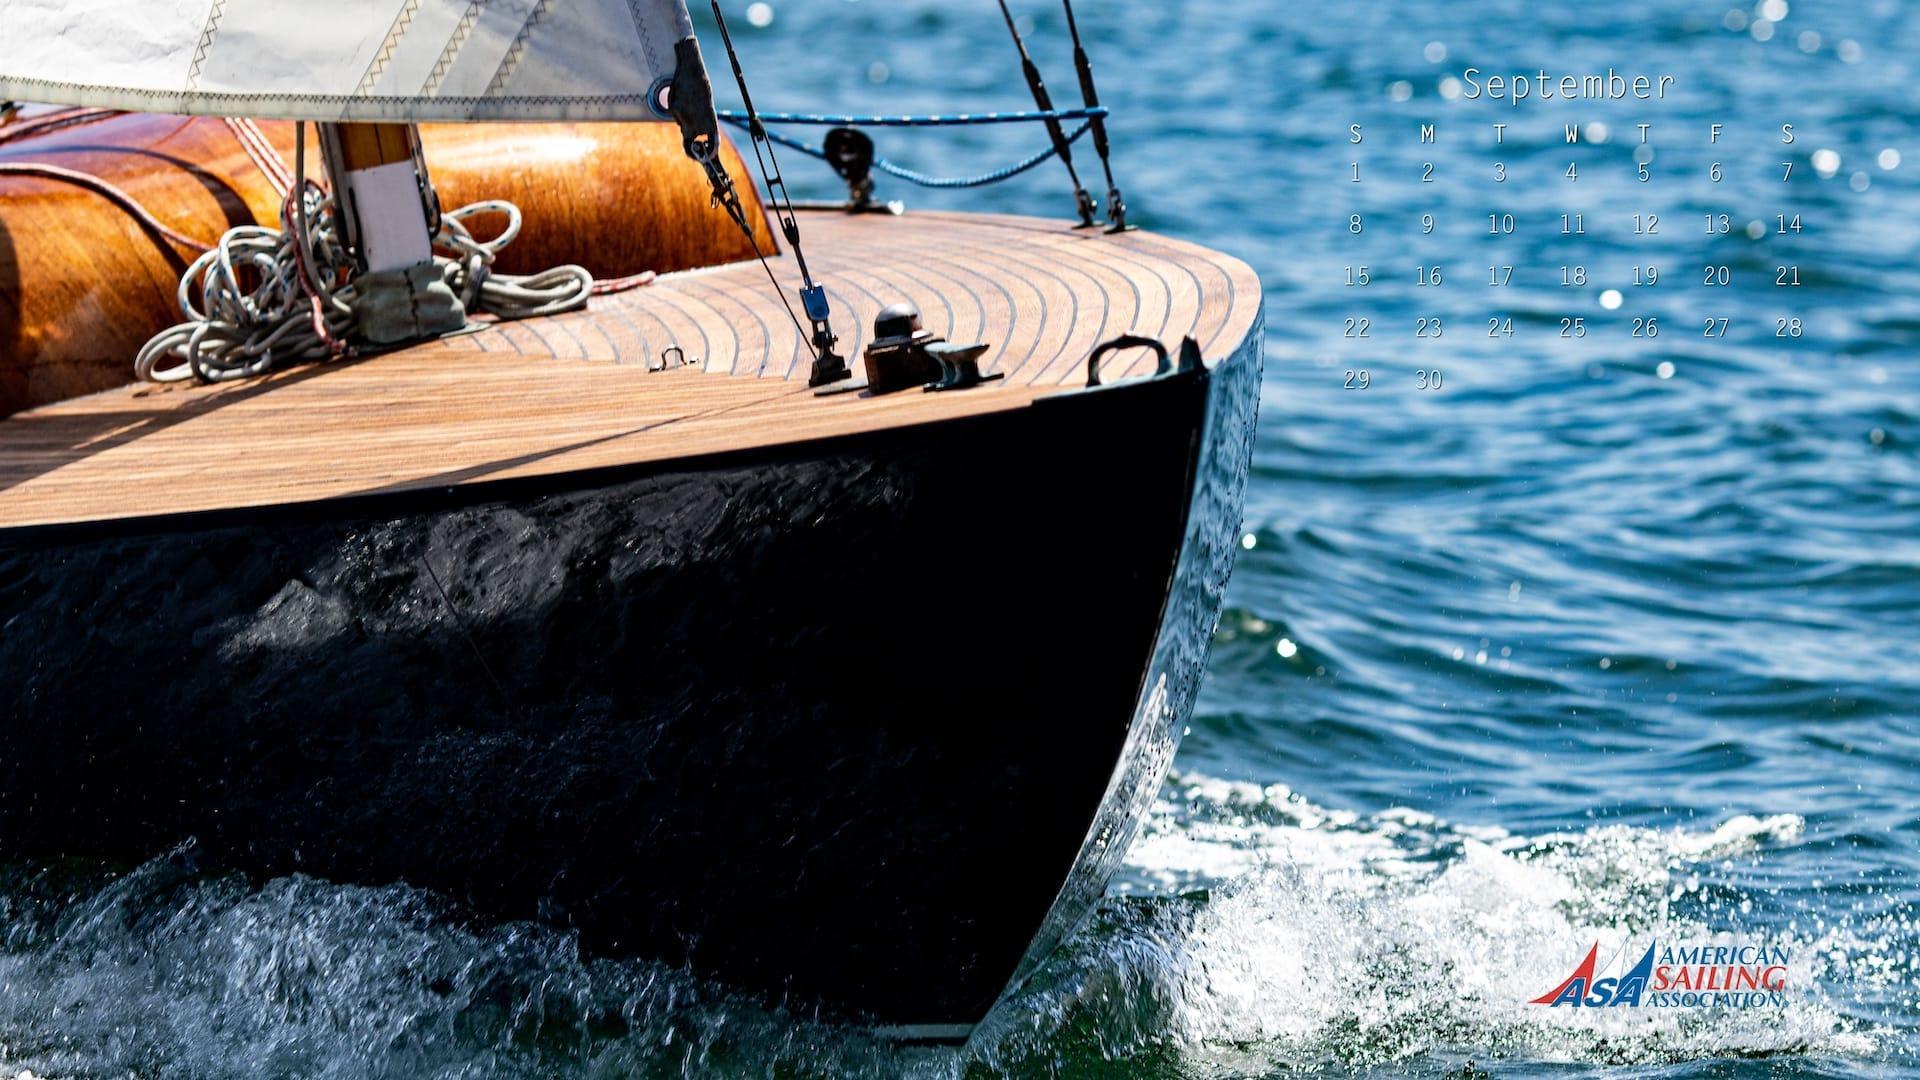 Sailing Desktop Wallpapers Top Free Sailing Desktop Backgrounds Wallpaperaccess